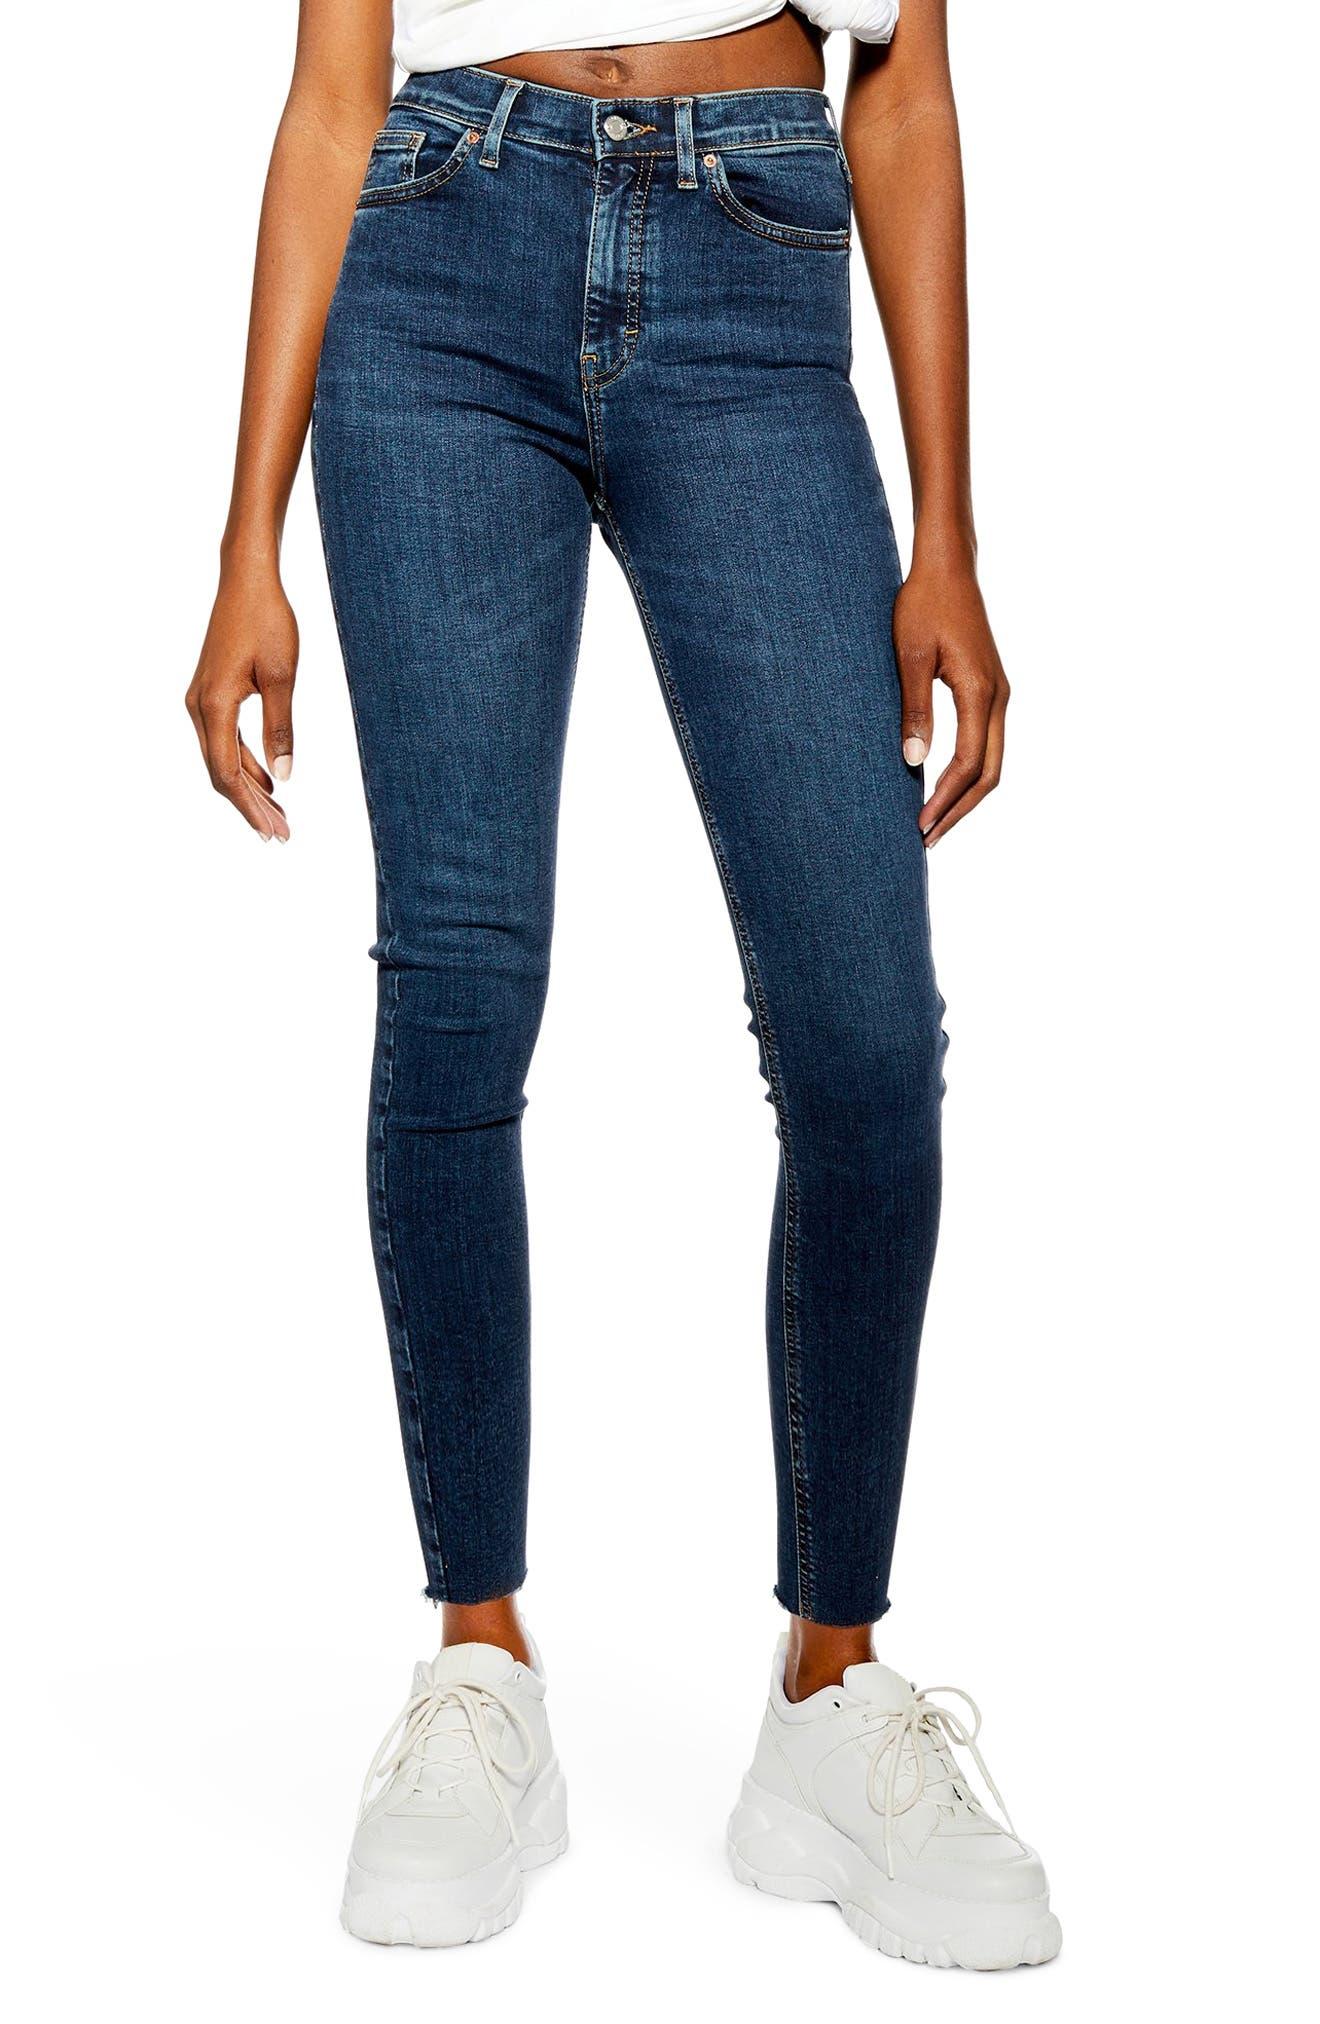 Petite Women's Topshop Jamie Vintage Jeans